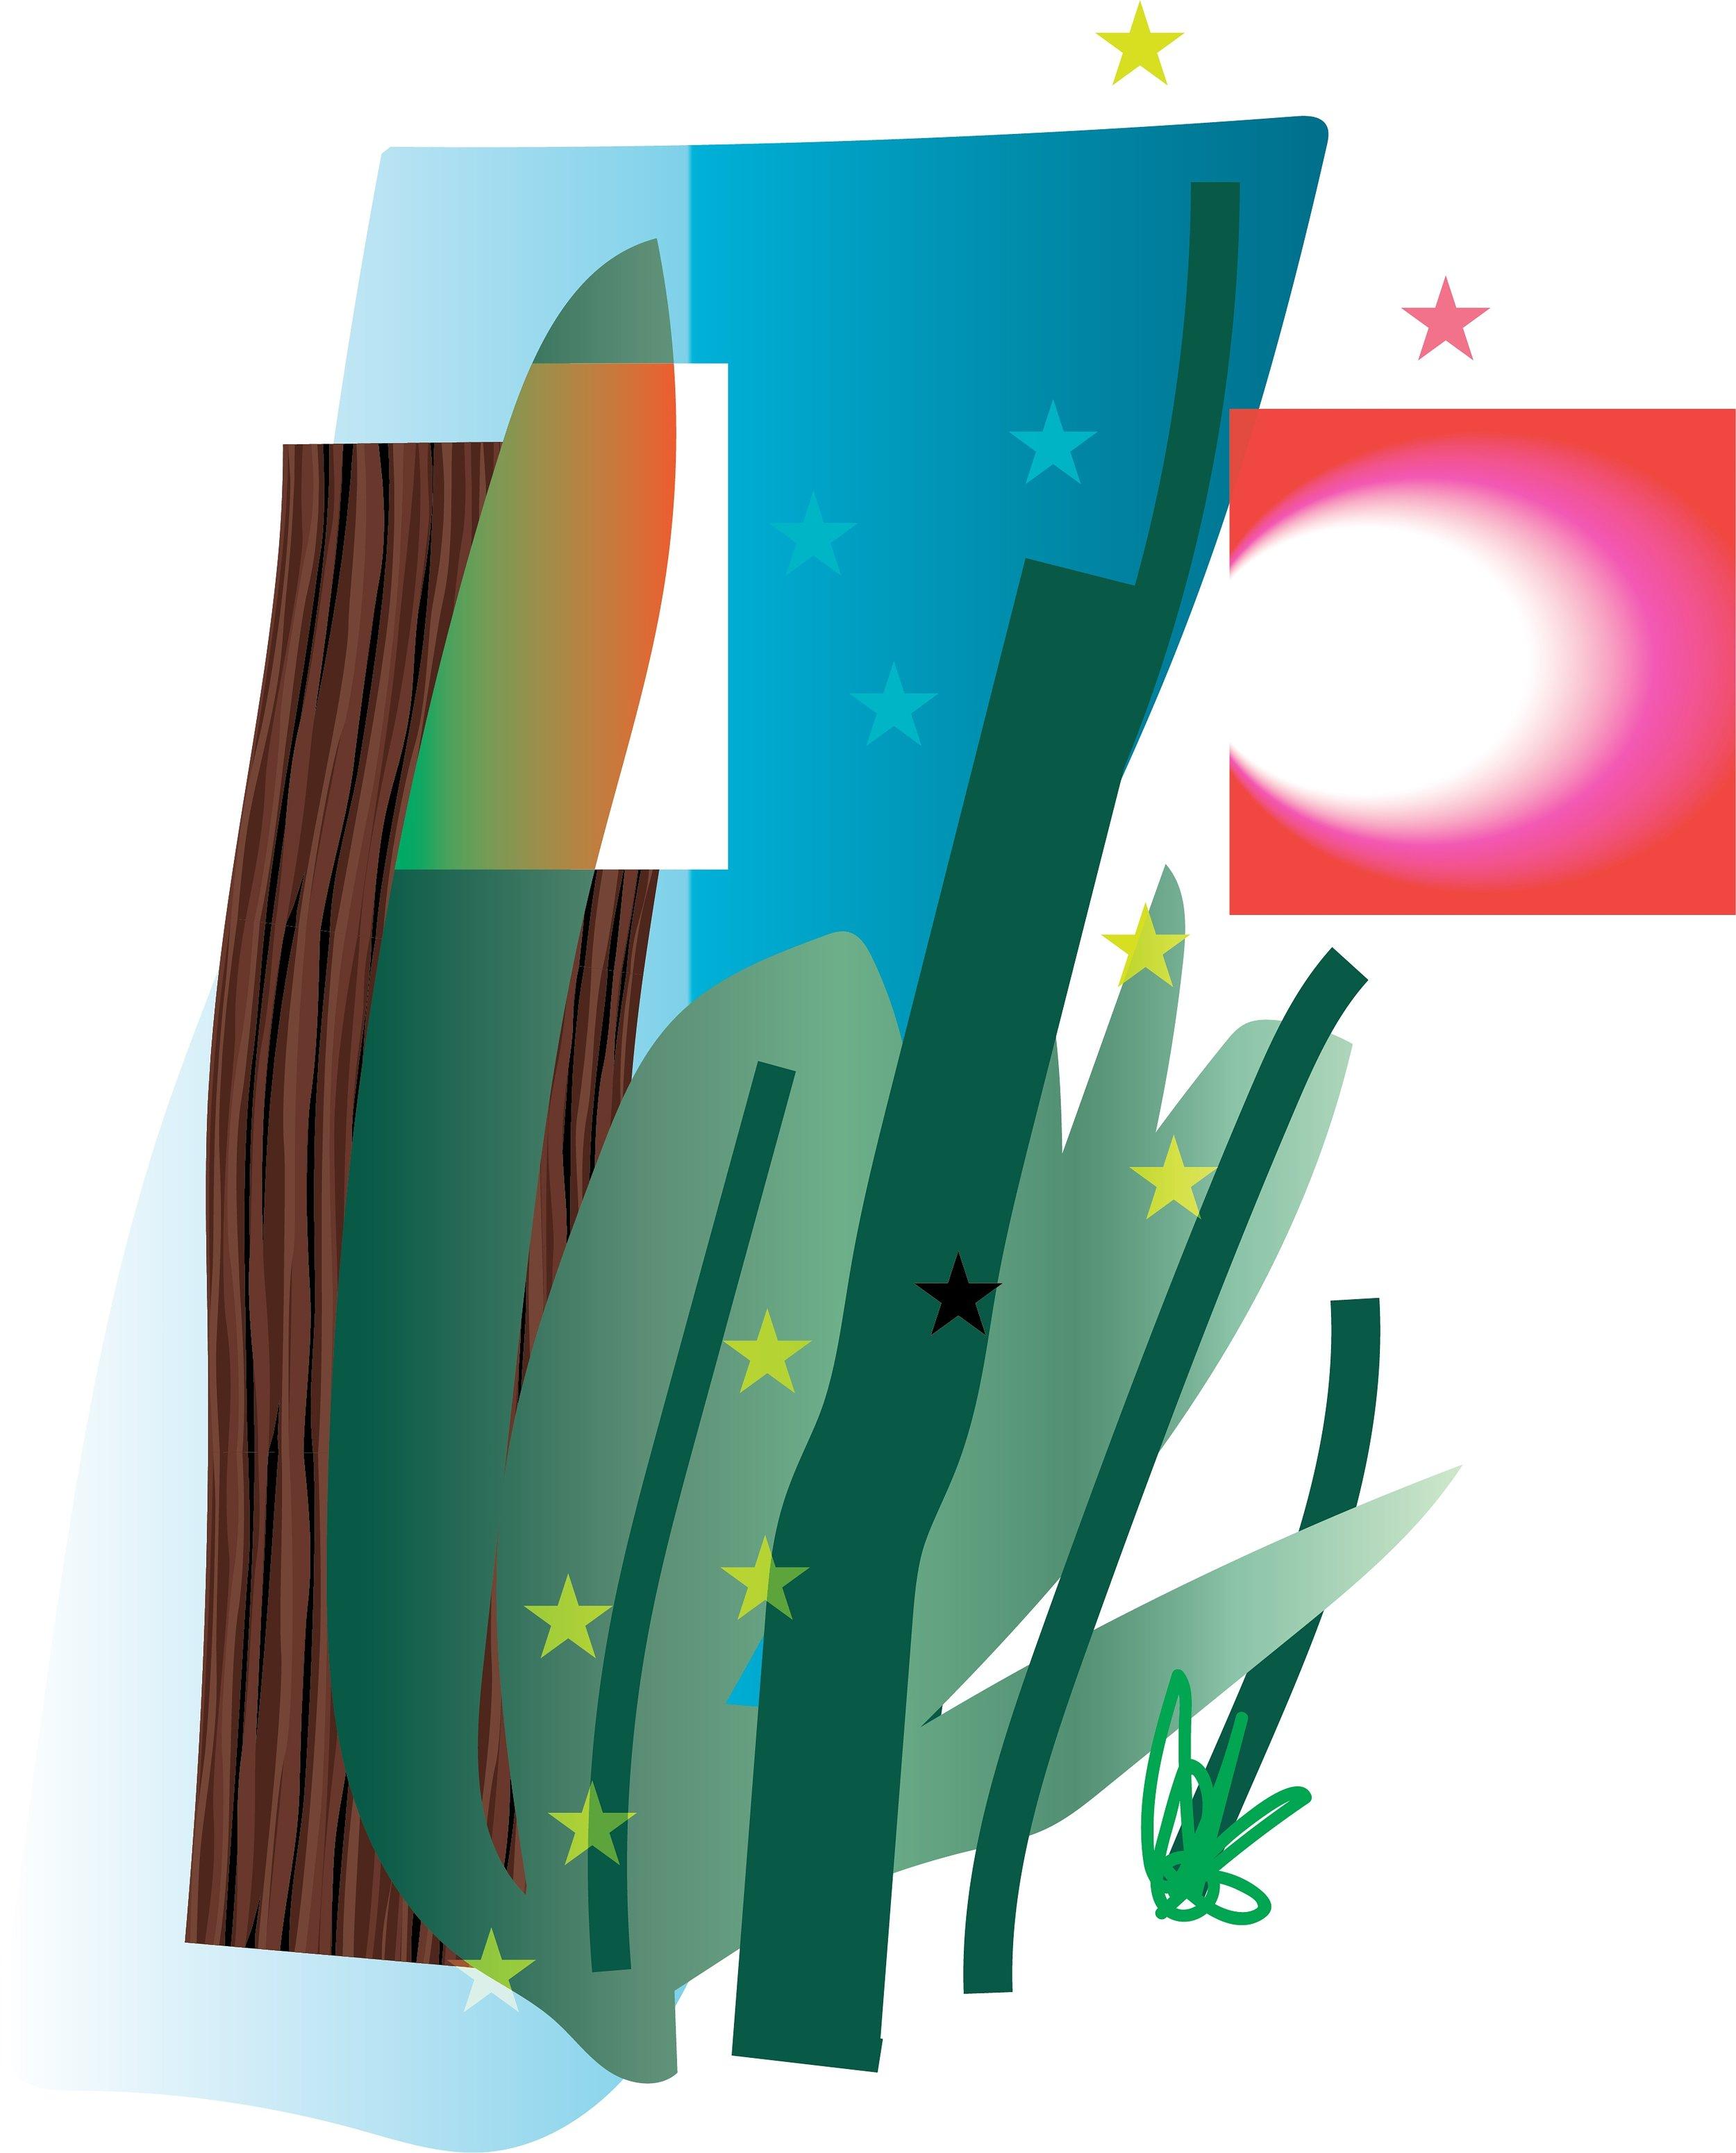 Illustration by Paradise Khanmalek